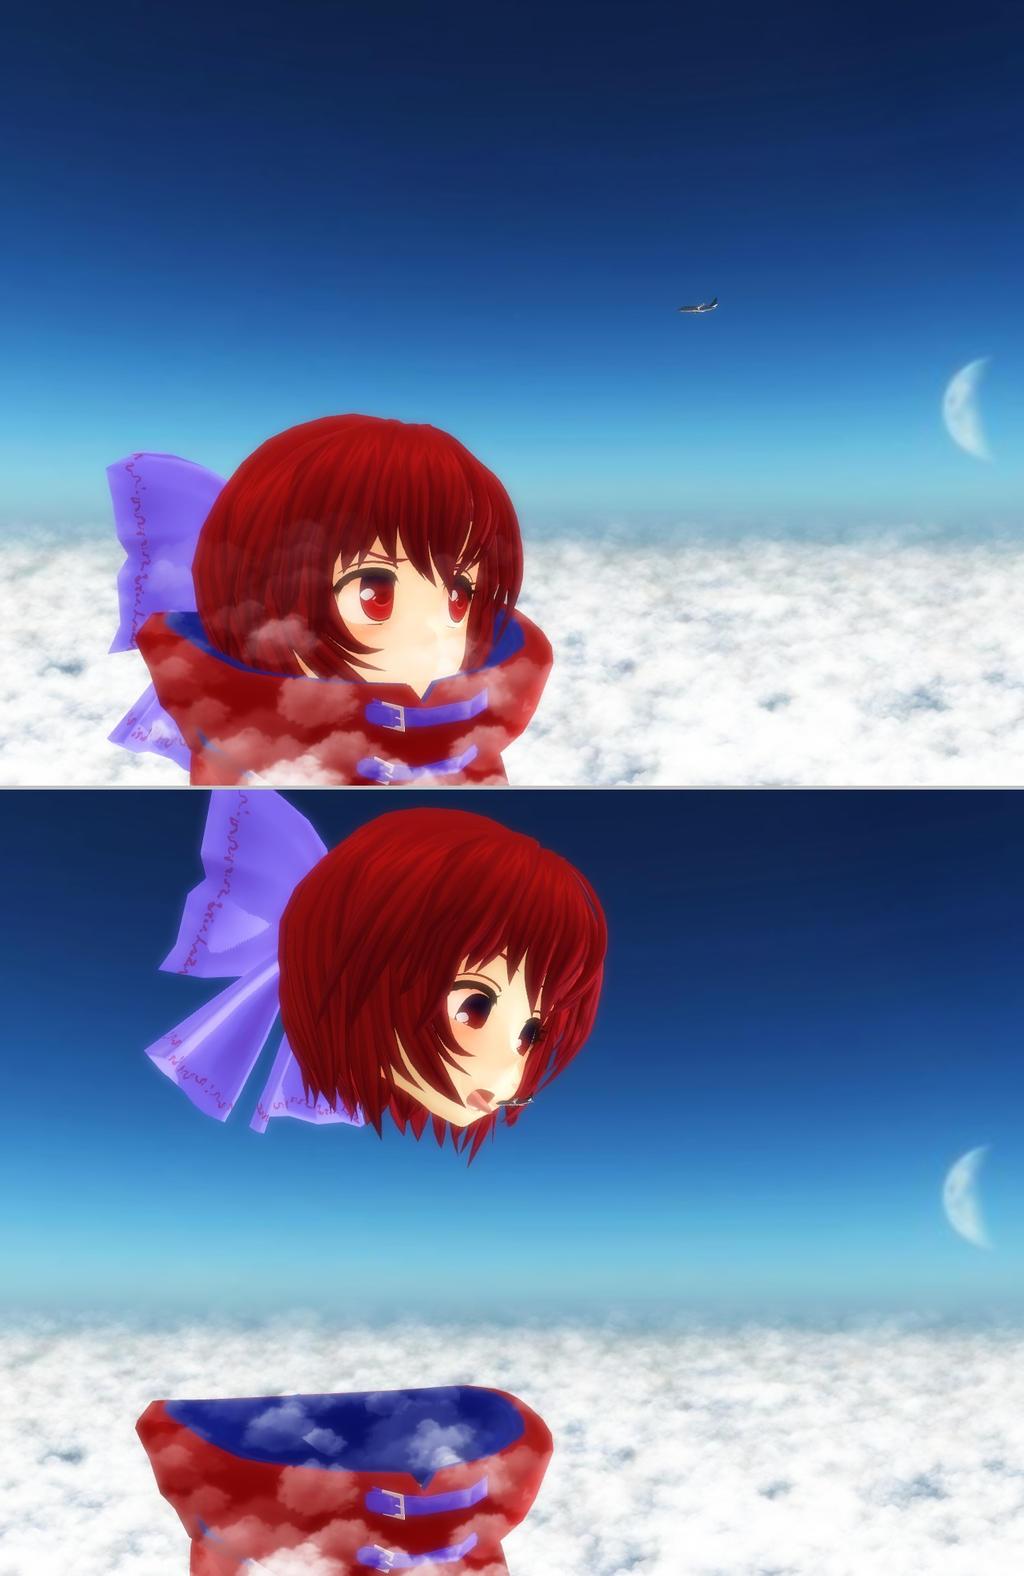 Sekibanki catches the overhead flight by Koirvon